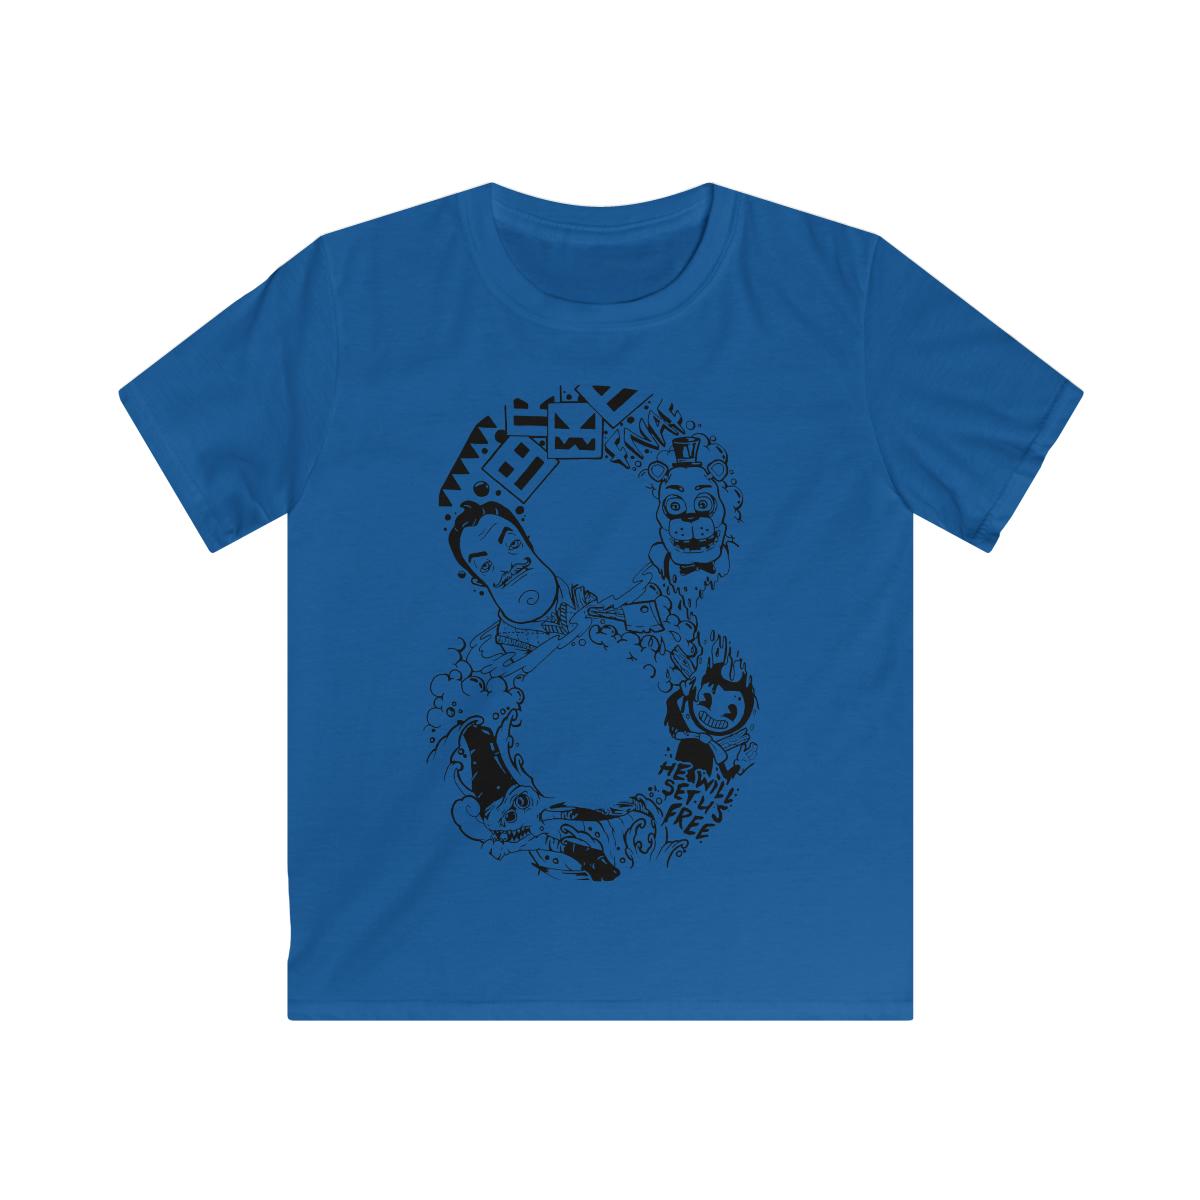 KIDS 8Bit T-Shirt